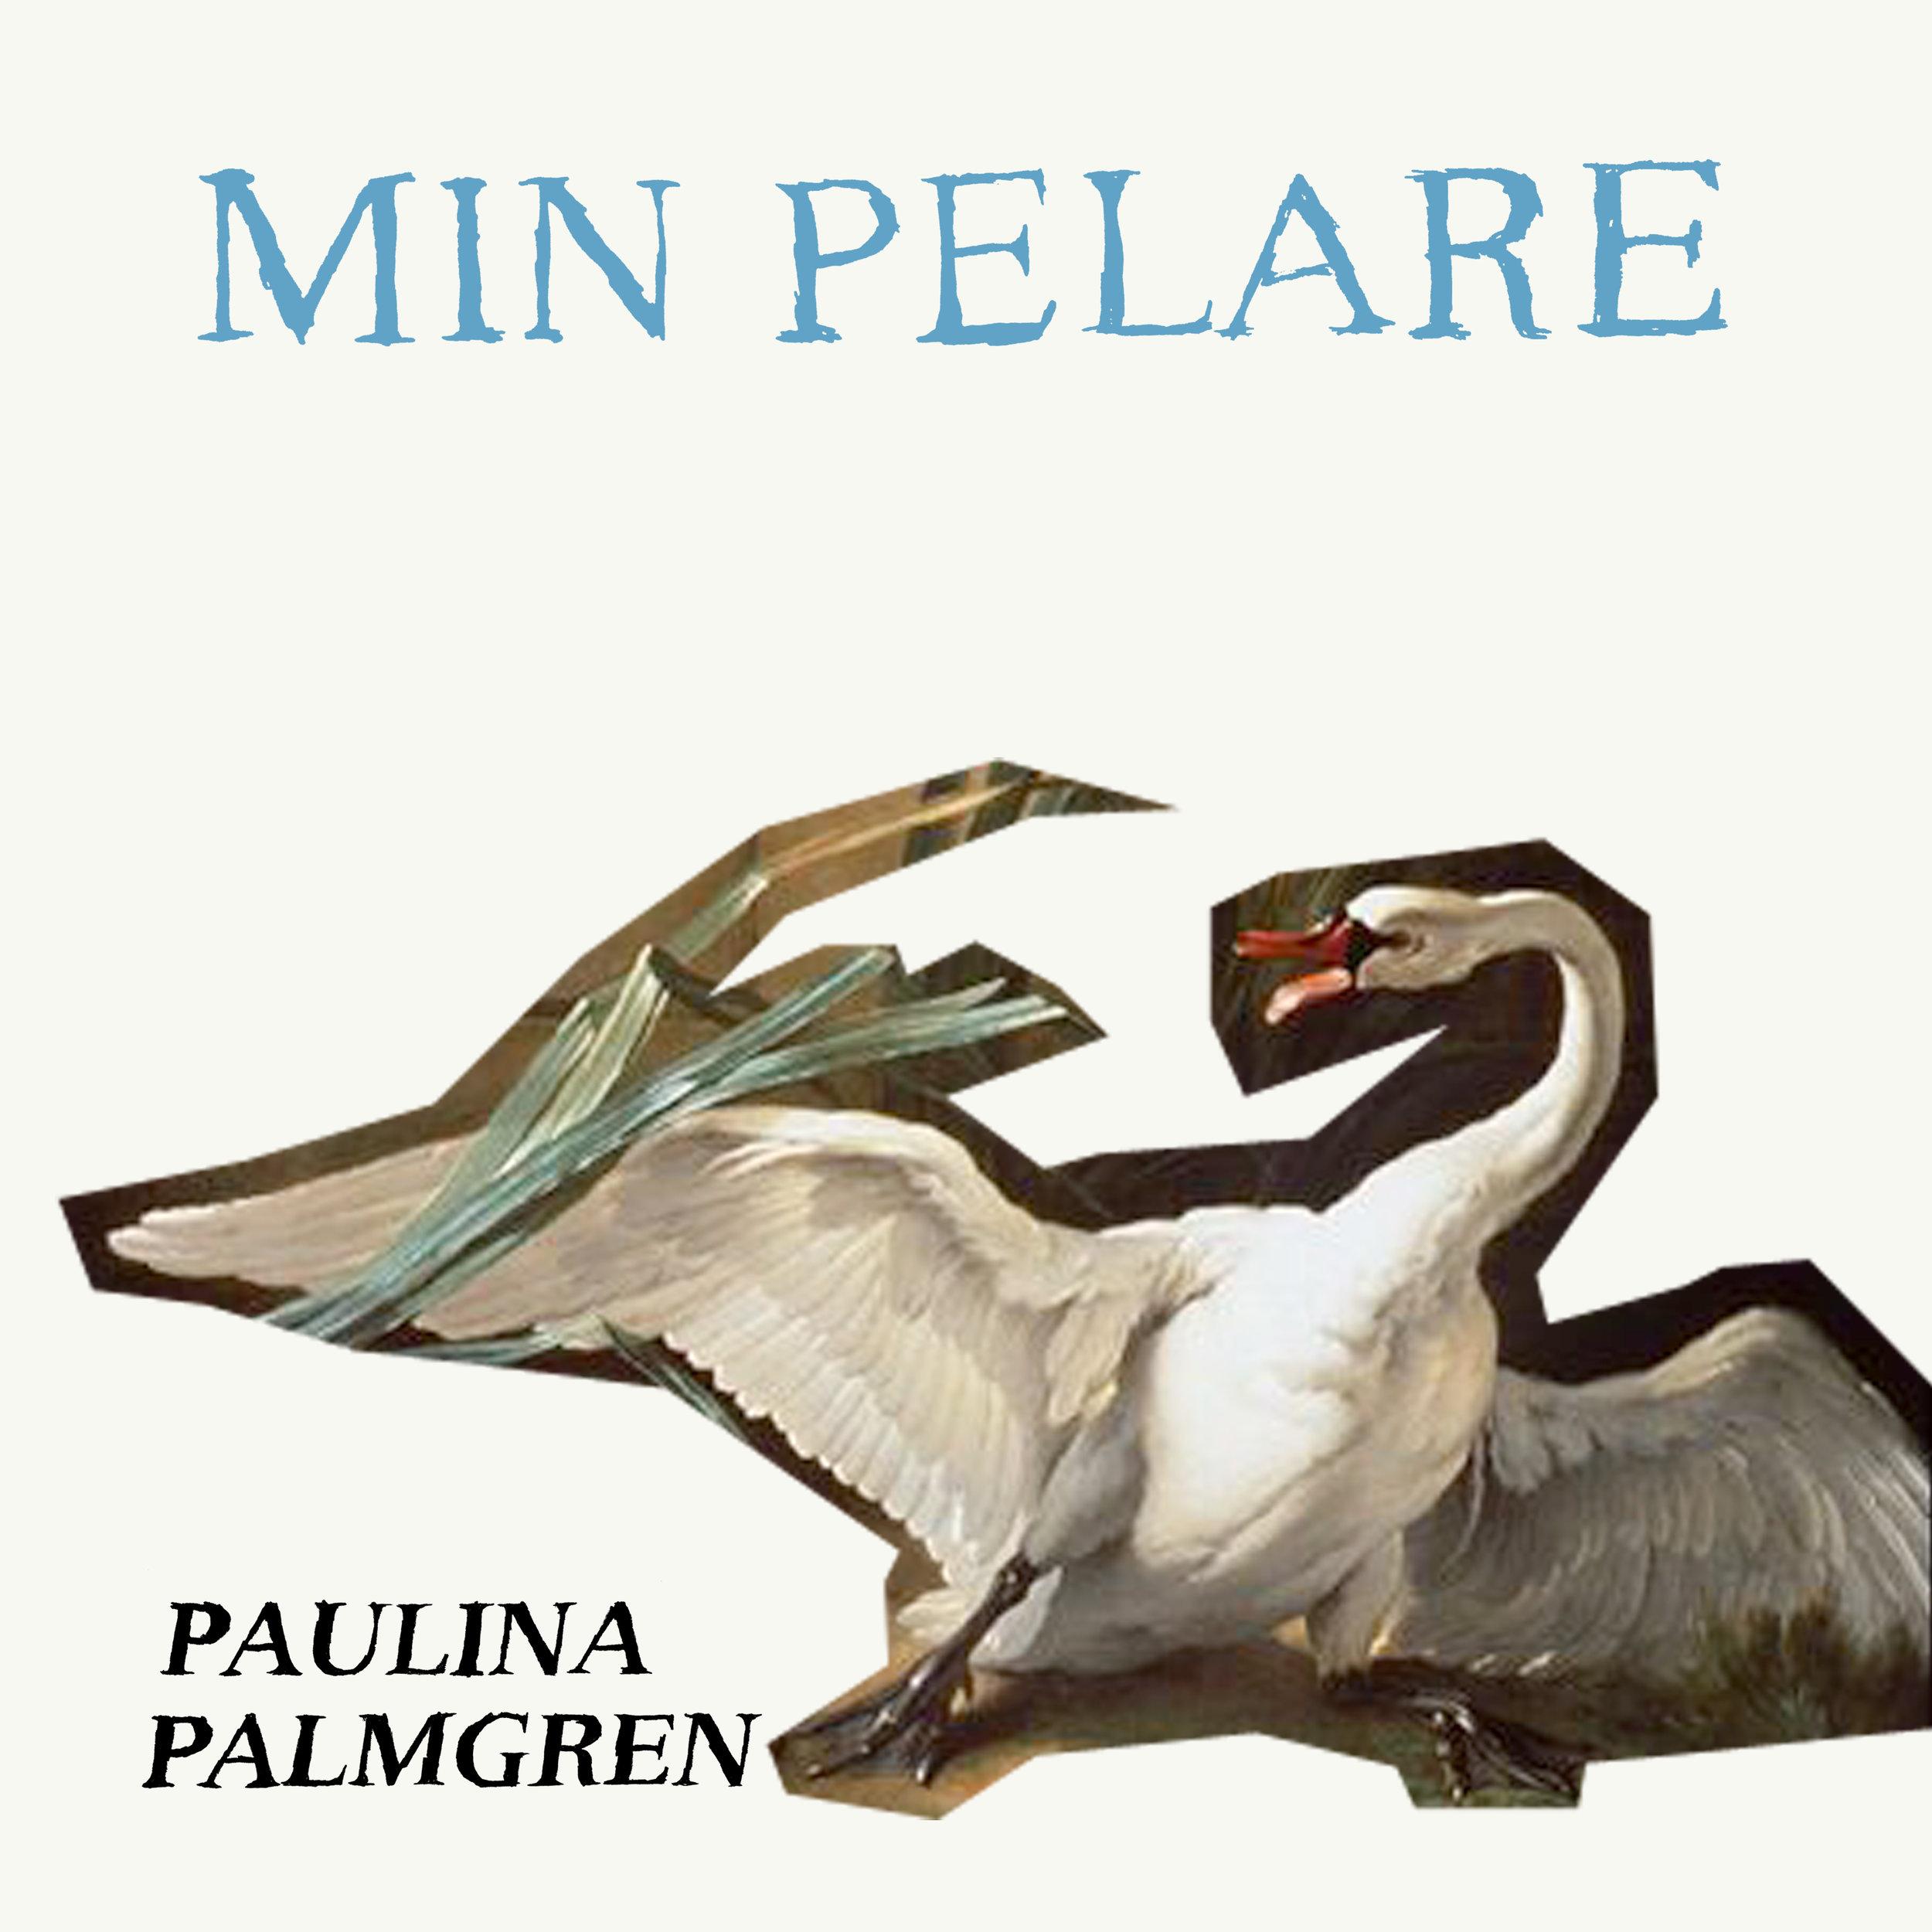 BIRDS075 - Paulina Palmgren - Min pelare